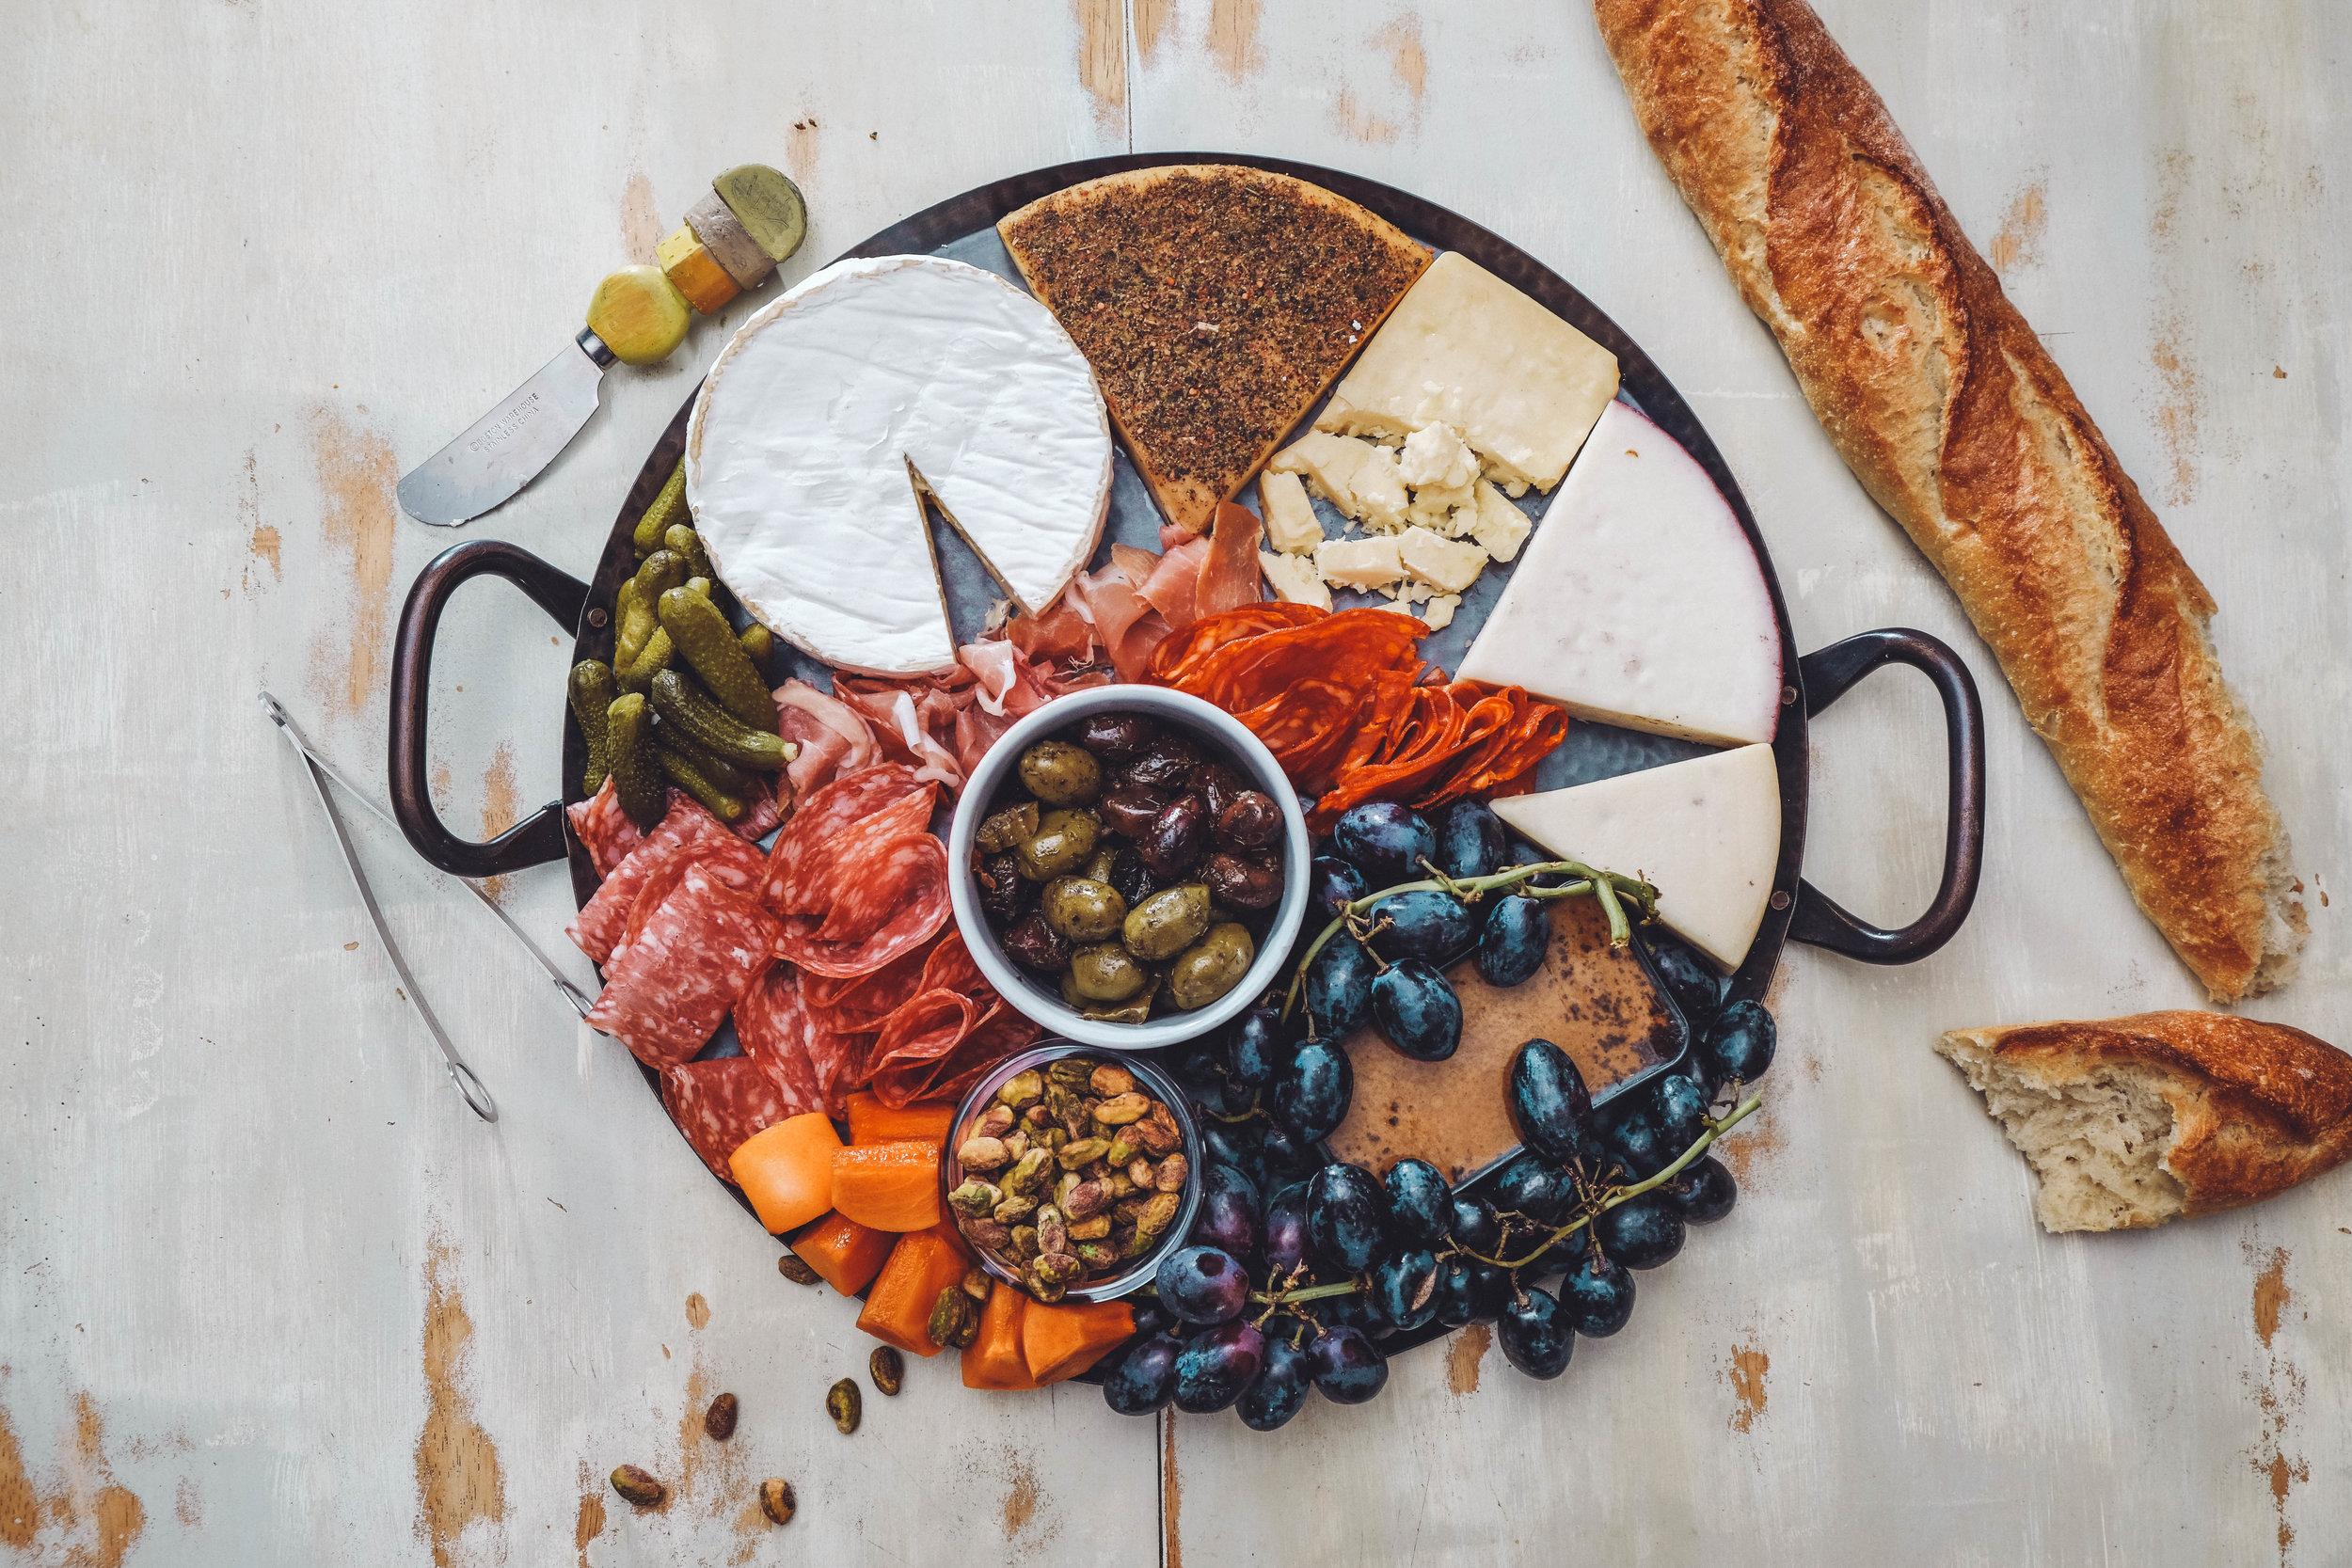 los olivos–the menu - By Private Celebrity Chef Melissa Pettito, RD